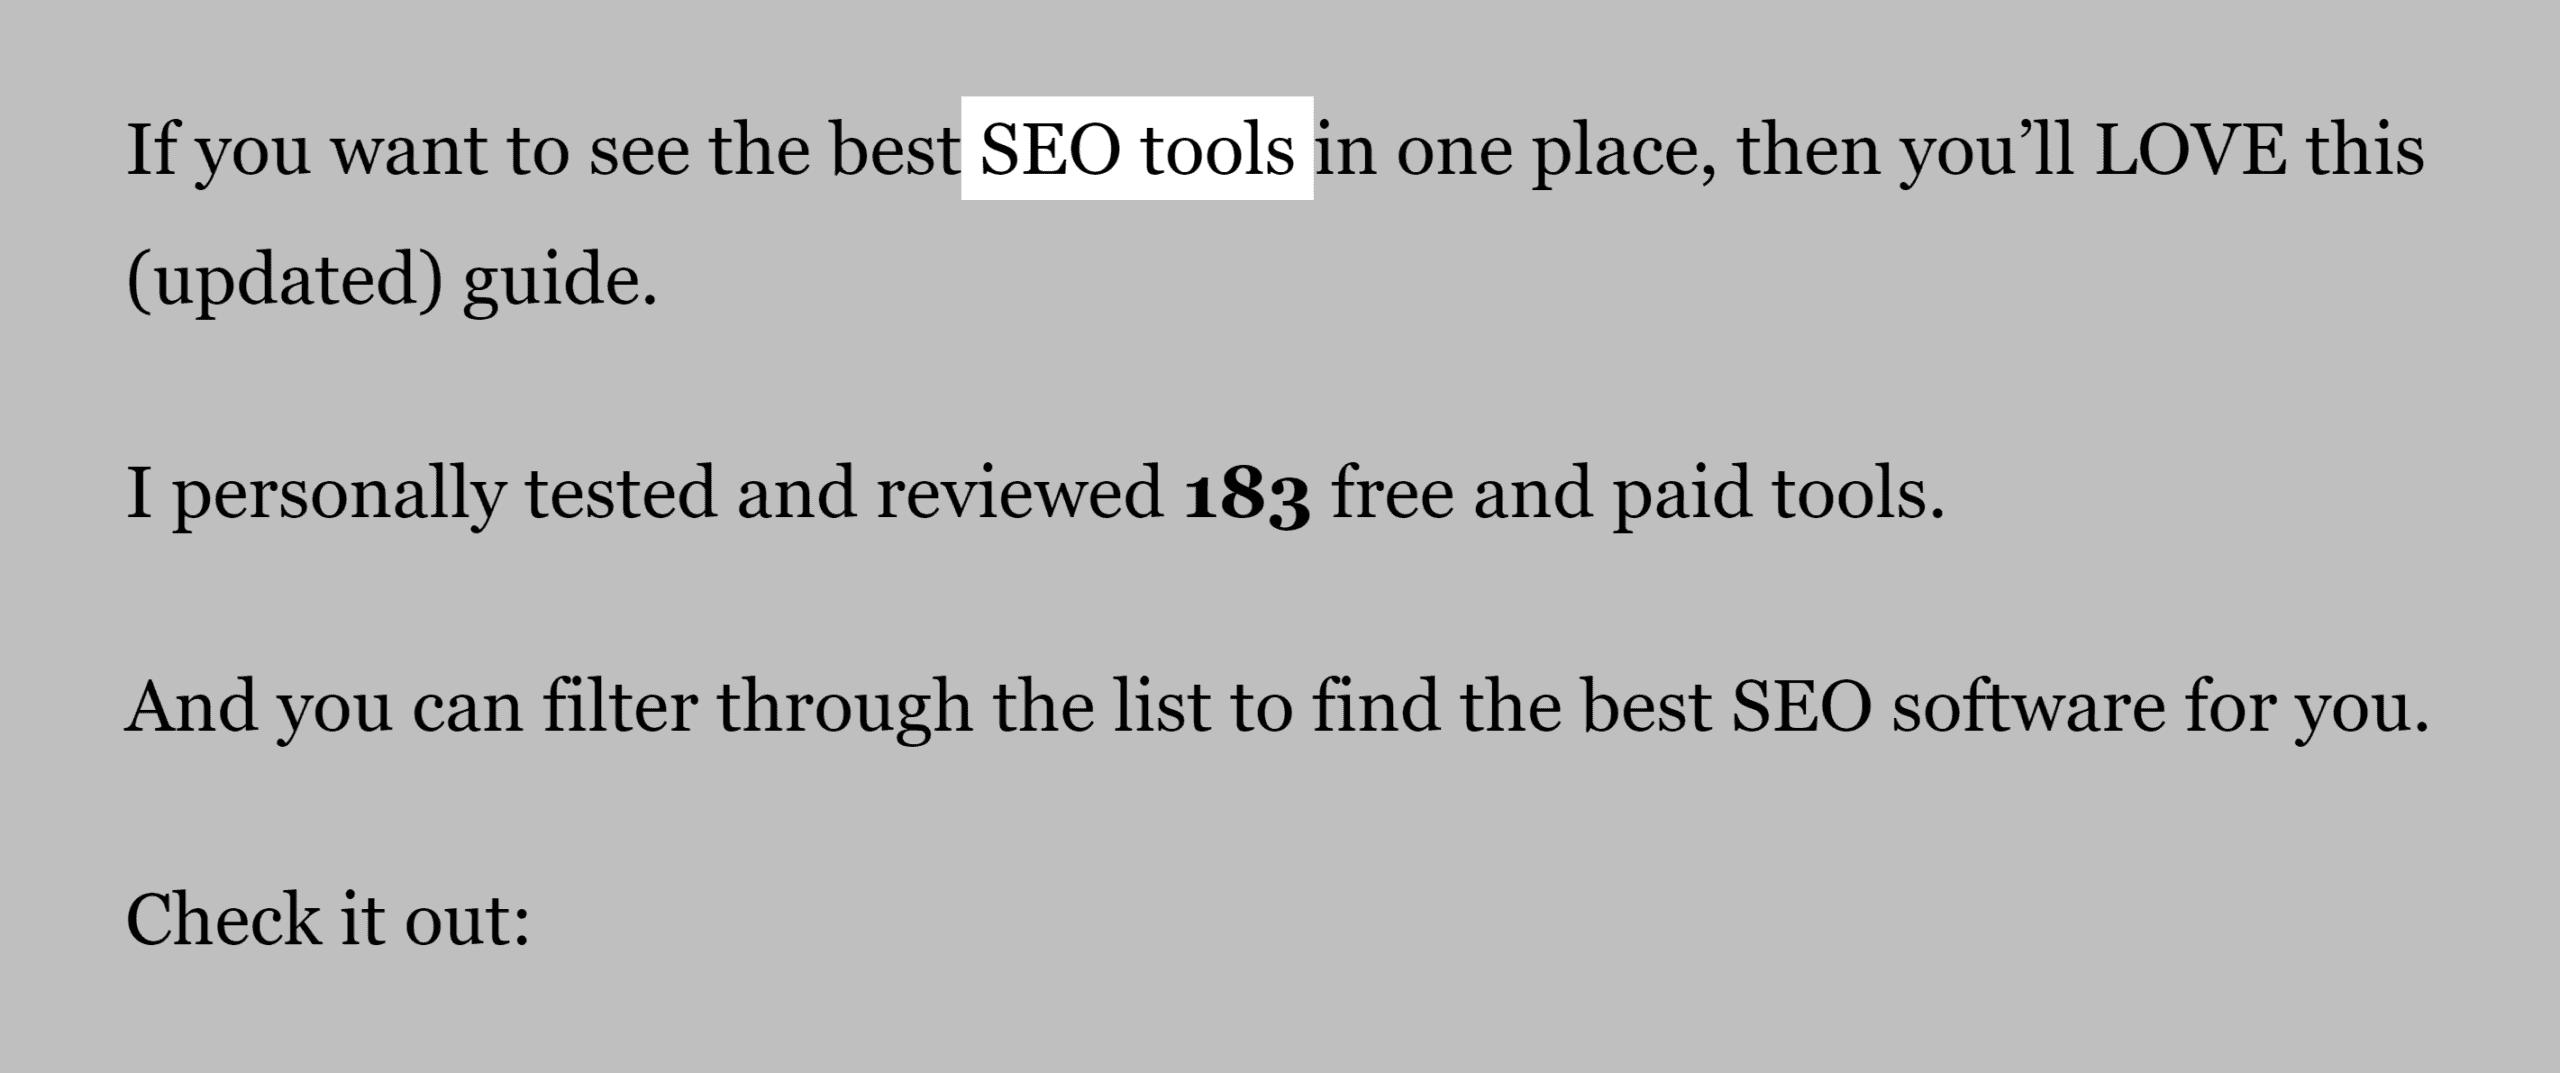 SEO tools post – Keyword in intro